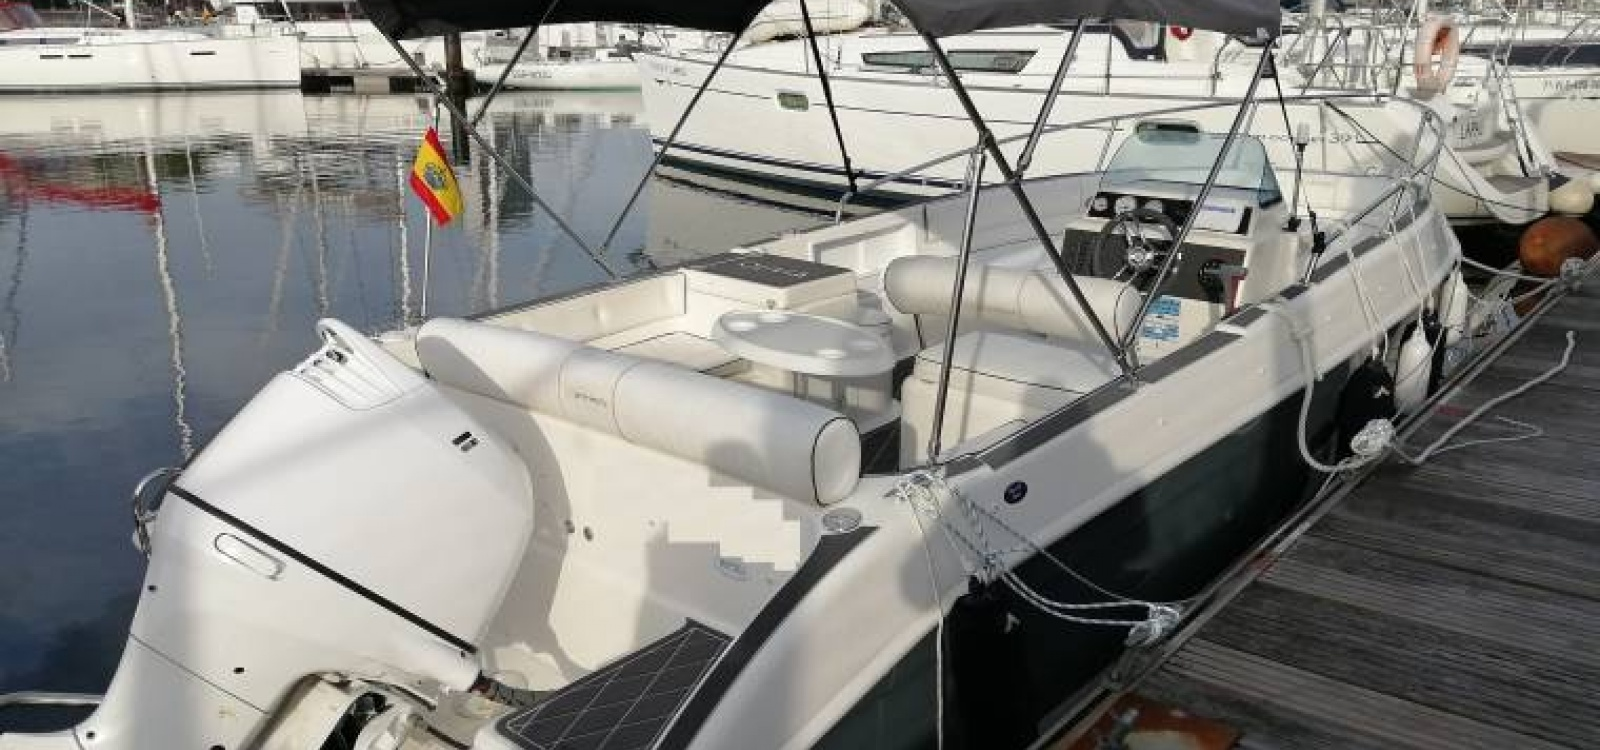 Vigo,Pontevedra,España,Barco a motor,2147